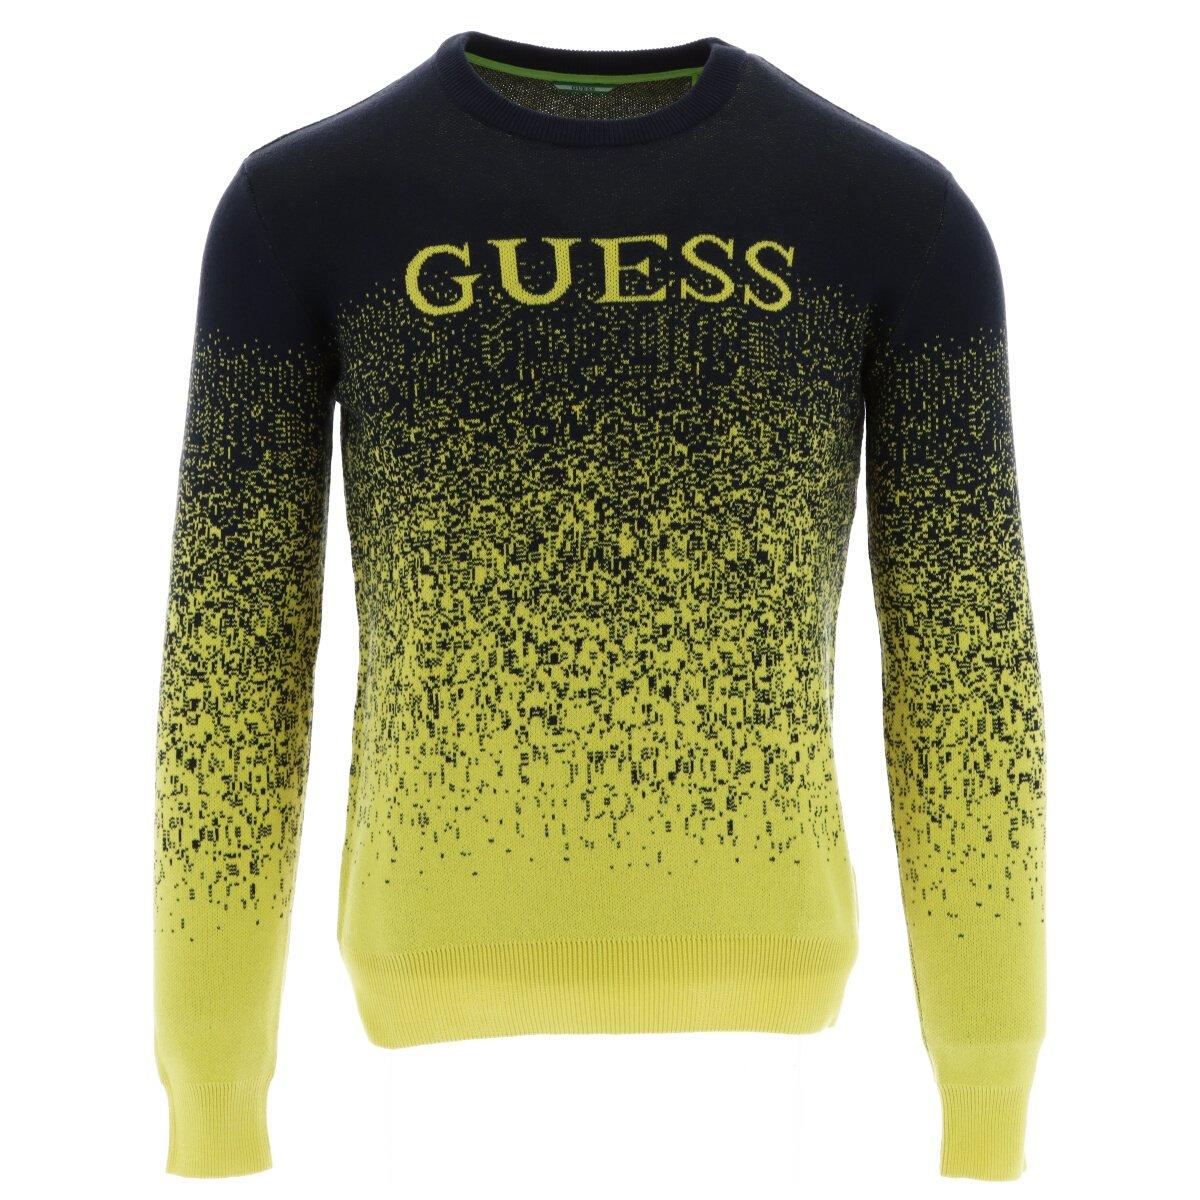 Guess Men's Sweater Various Colours 307417 - blue-1 XS